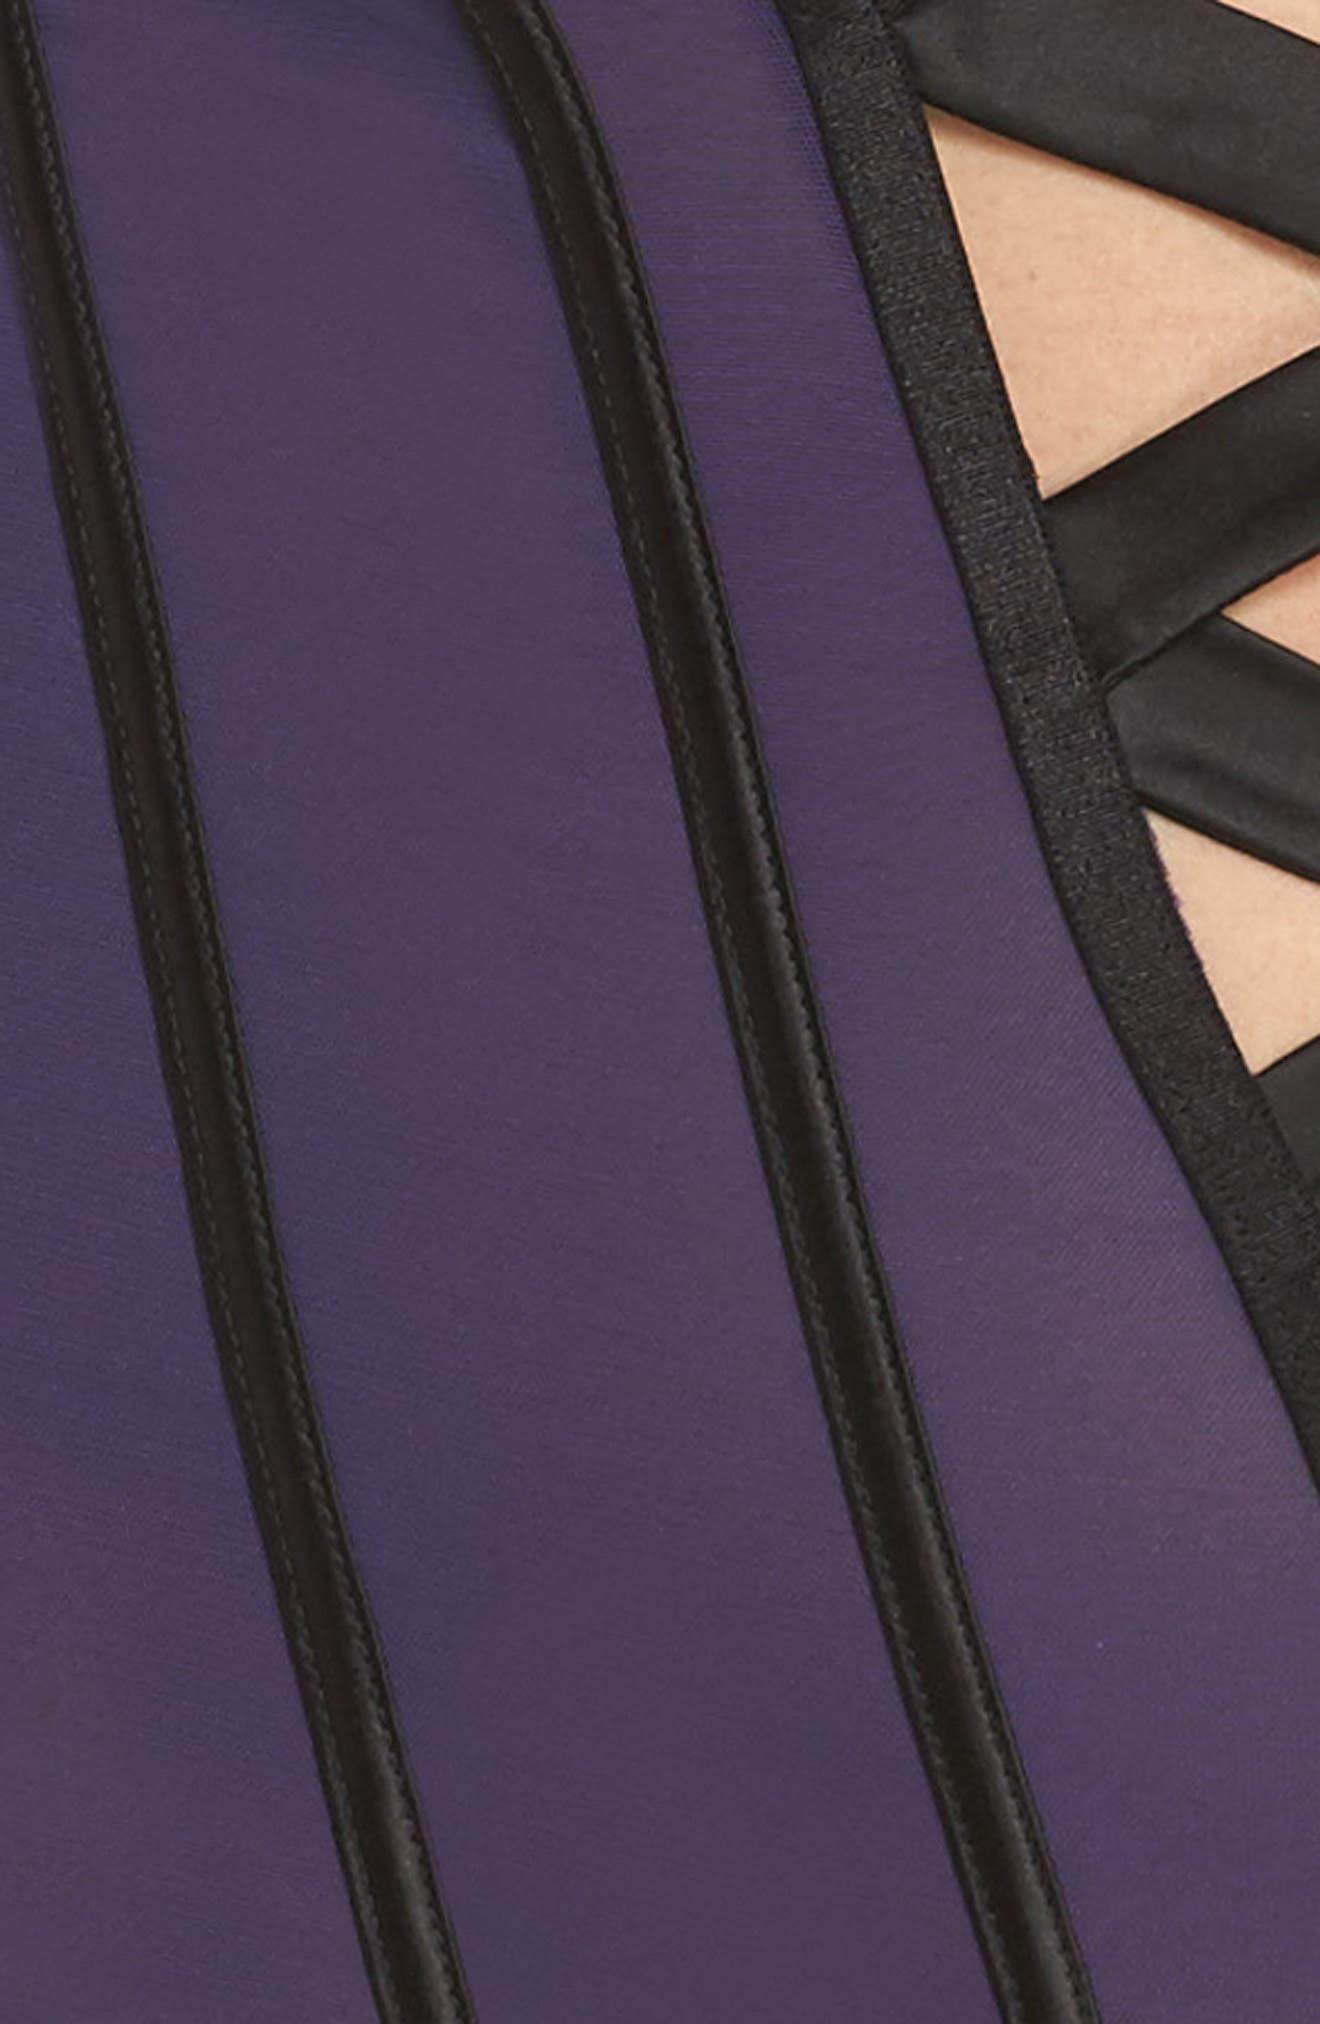 Ines Crisscross Plunge Bodysuit,                             Alternate thumbnail 4, color,                             400